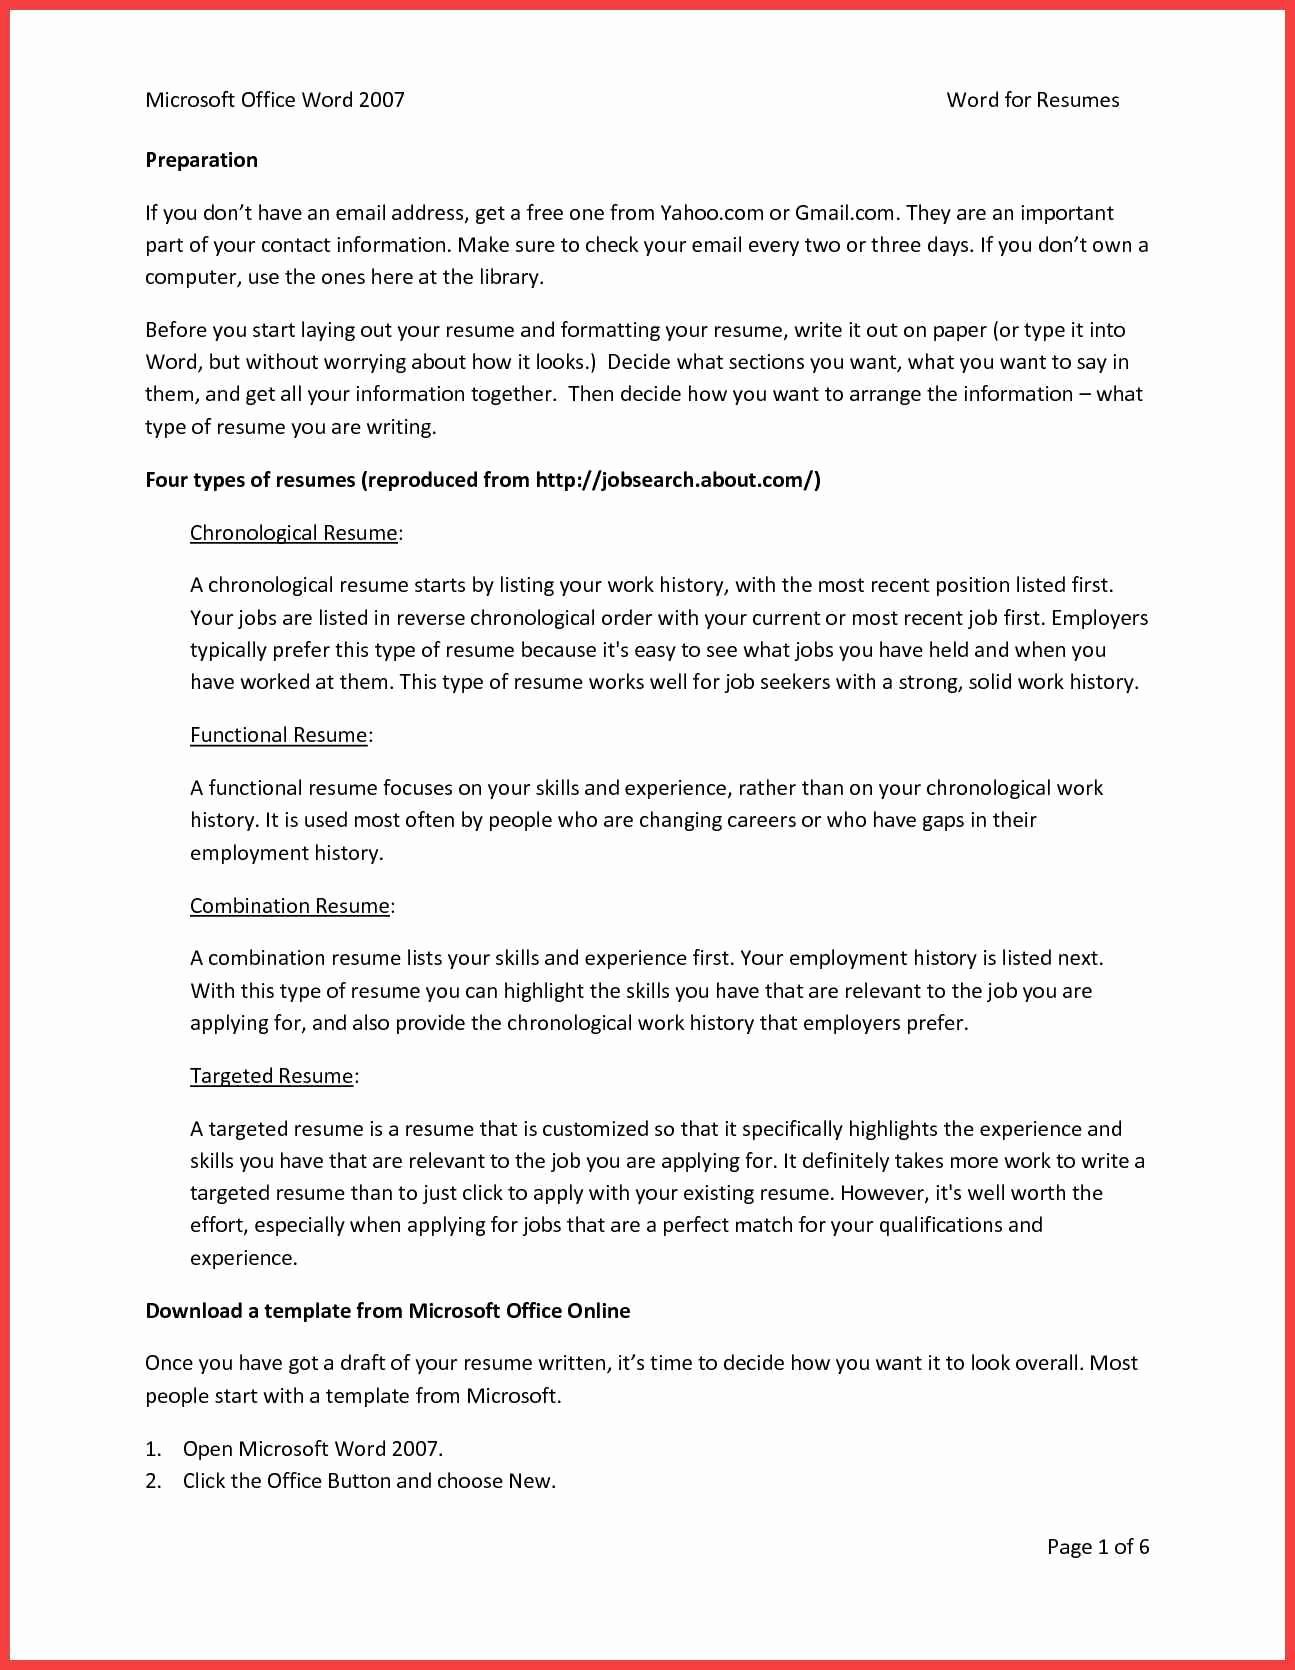 Resume Template Microsoft Word 2007 New Skills Resume Template Word